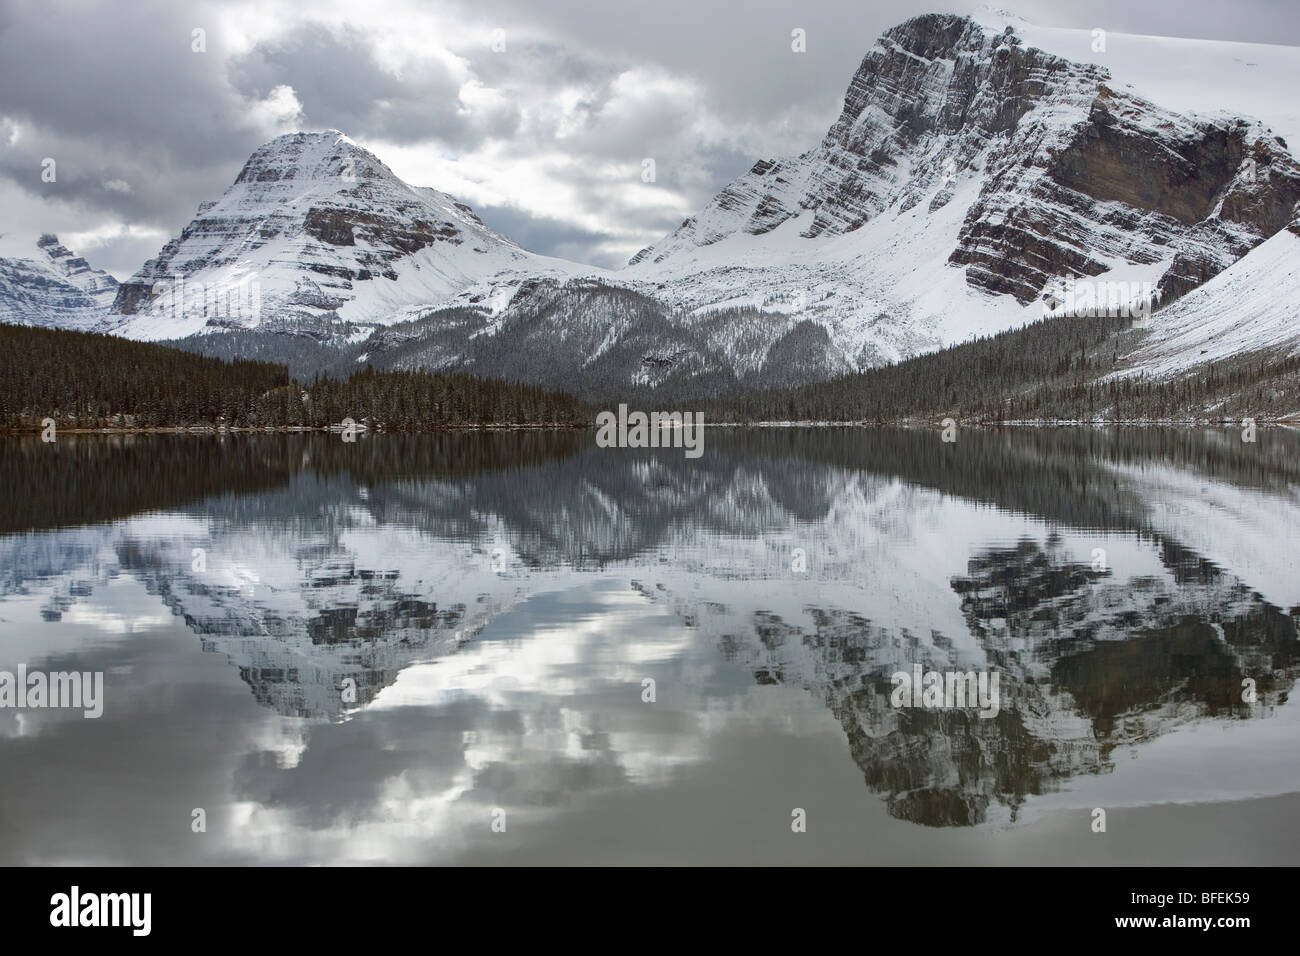 Bow Lake, Bow Peak at Bow Summit, Banff National Park, Alberta, Canada - Stock Image